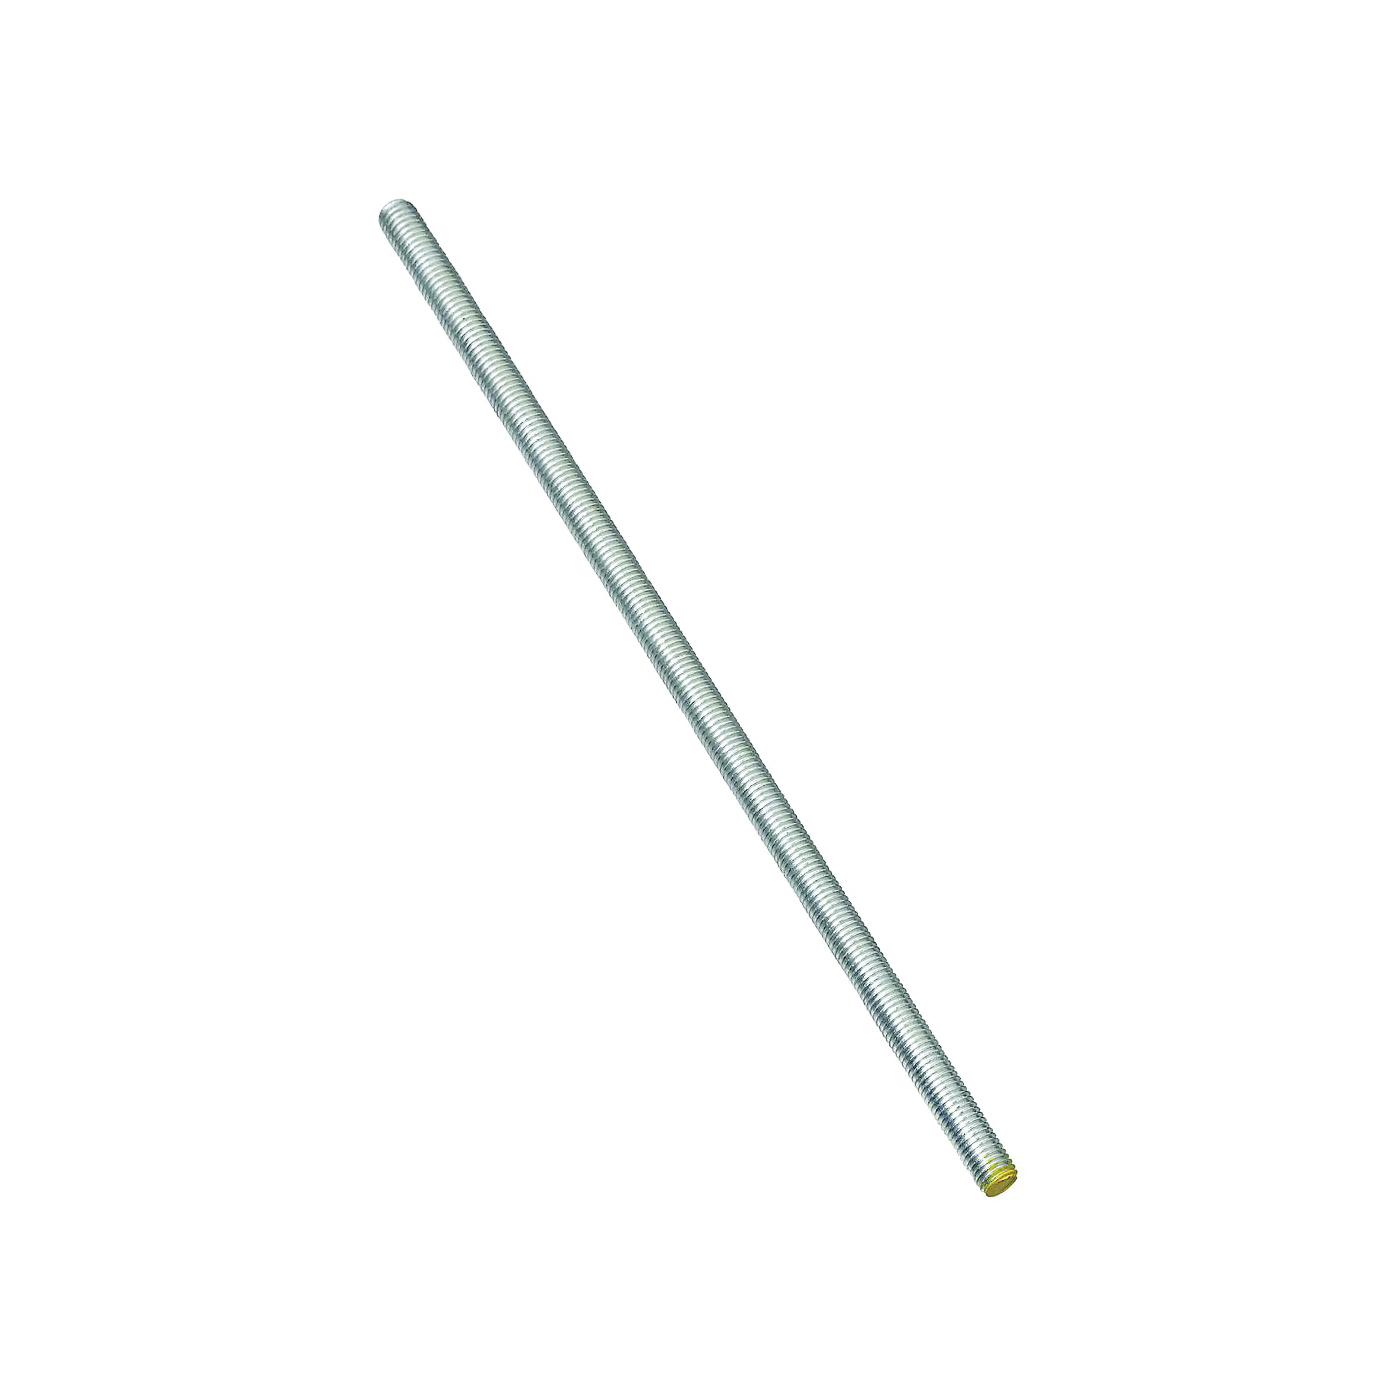 Picture of Stanley Hardware 179606 Threaded Rod, 3/8-16 Thread, 72 in L, A Grade, Steel, Zinc, UNC Thread